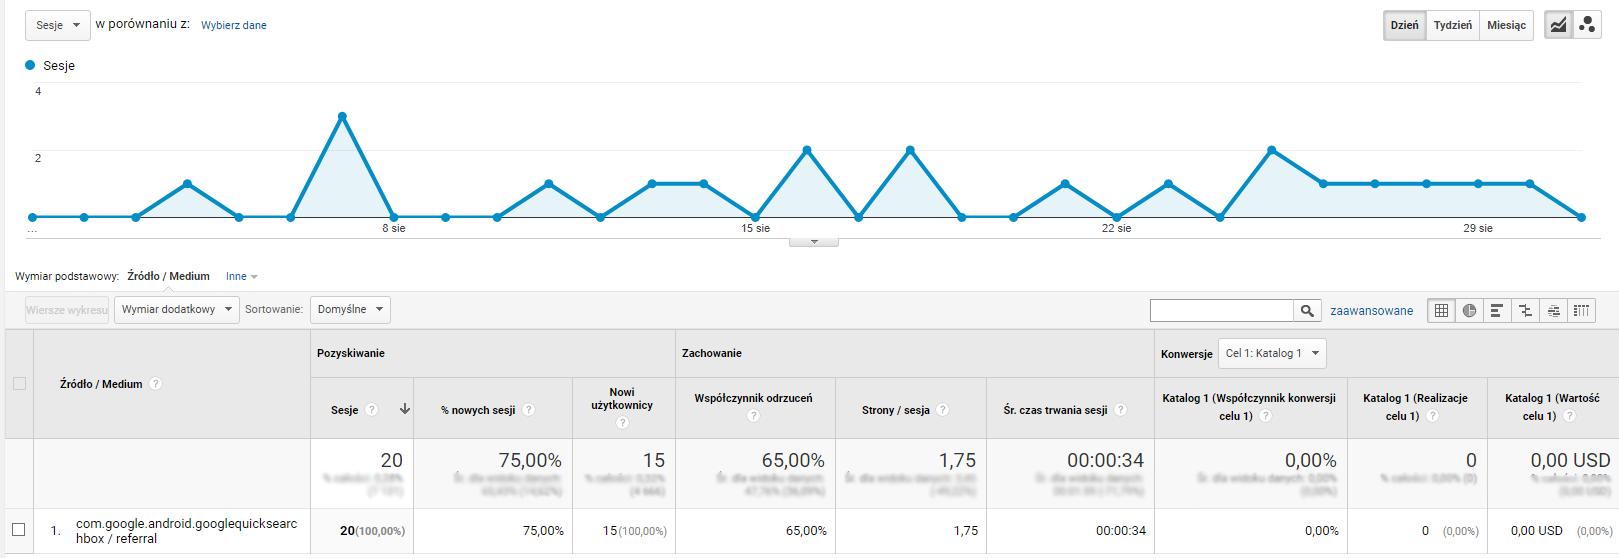 Miesięczny ruch z com.google.android.googlequicksearchbox dla medium referral do 31 sierpnia.